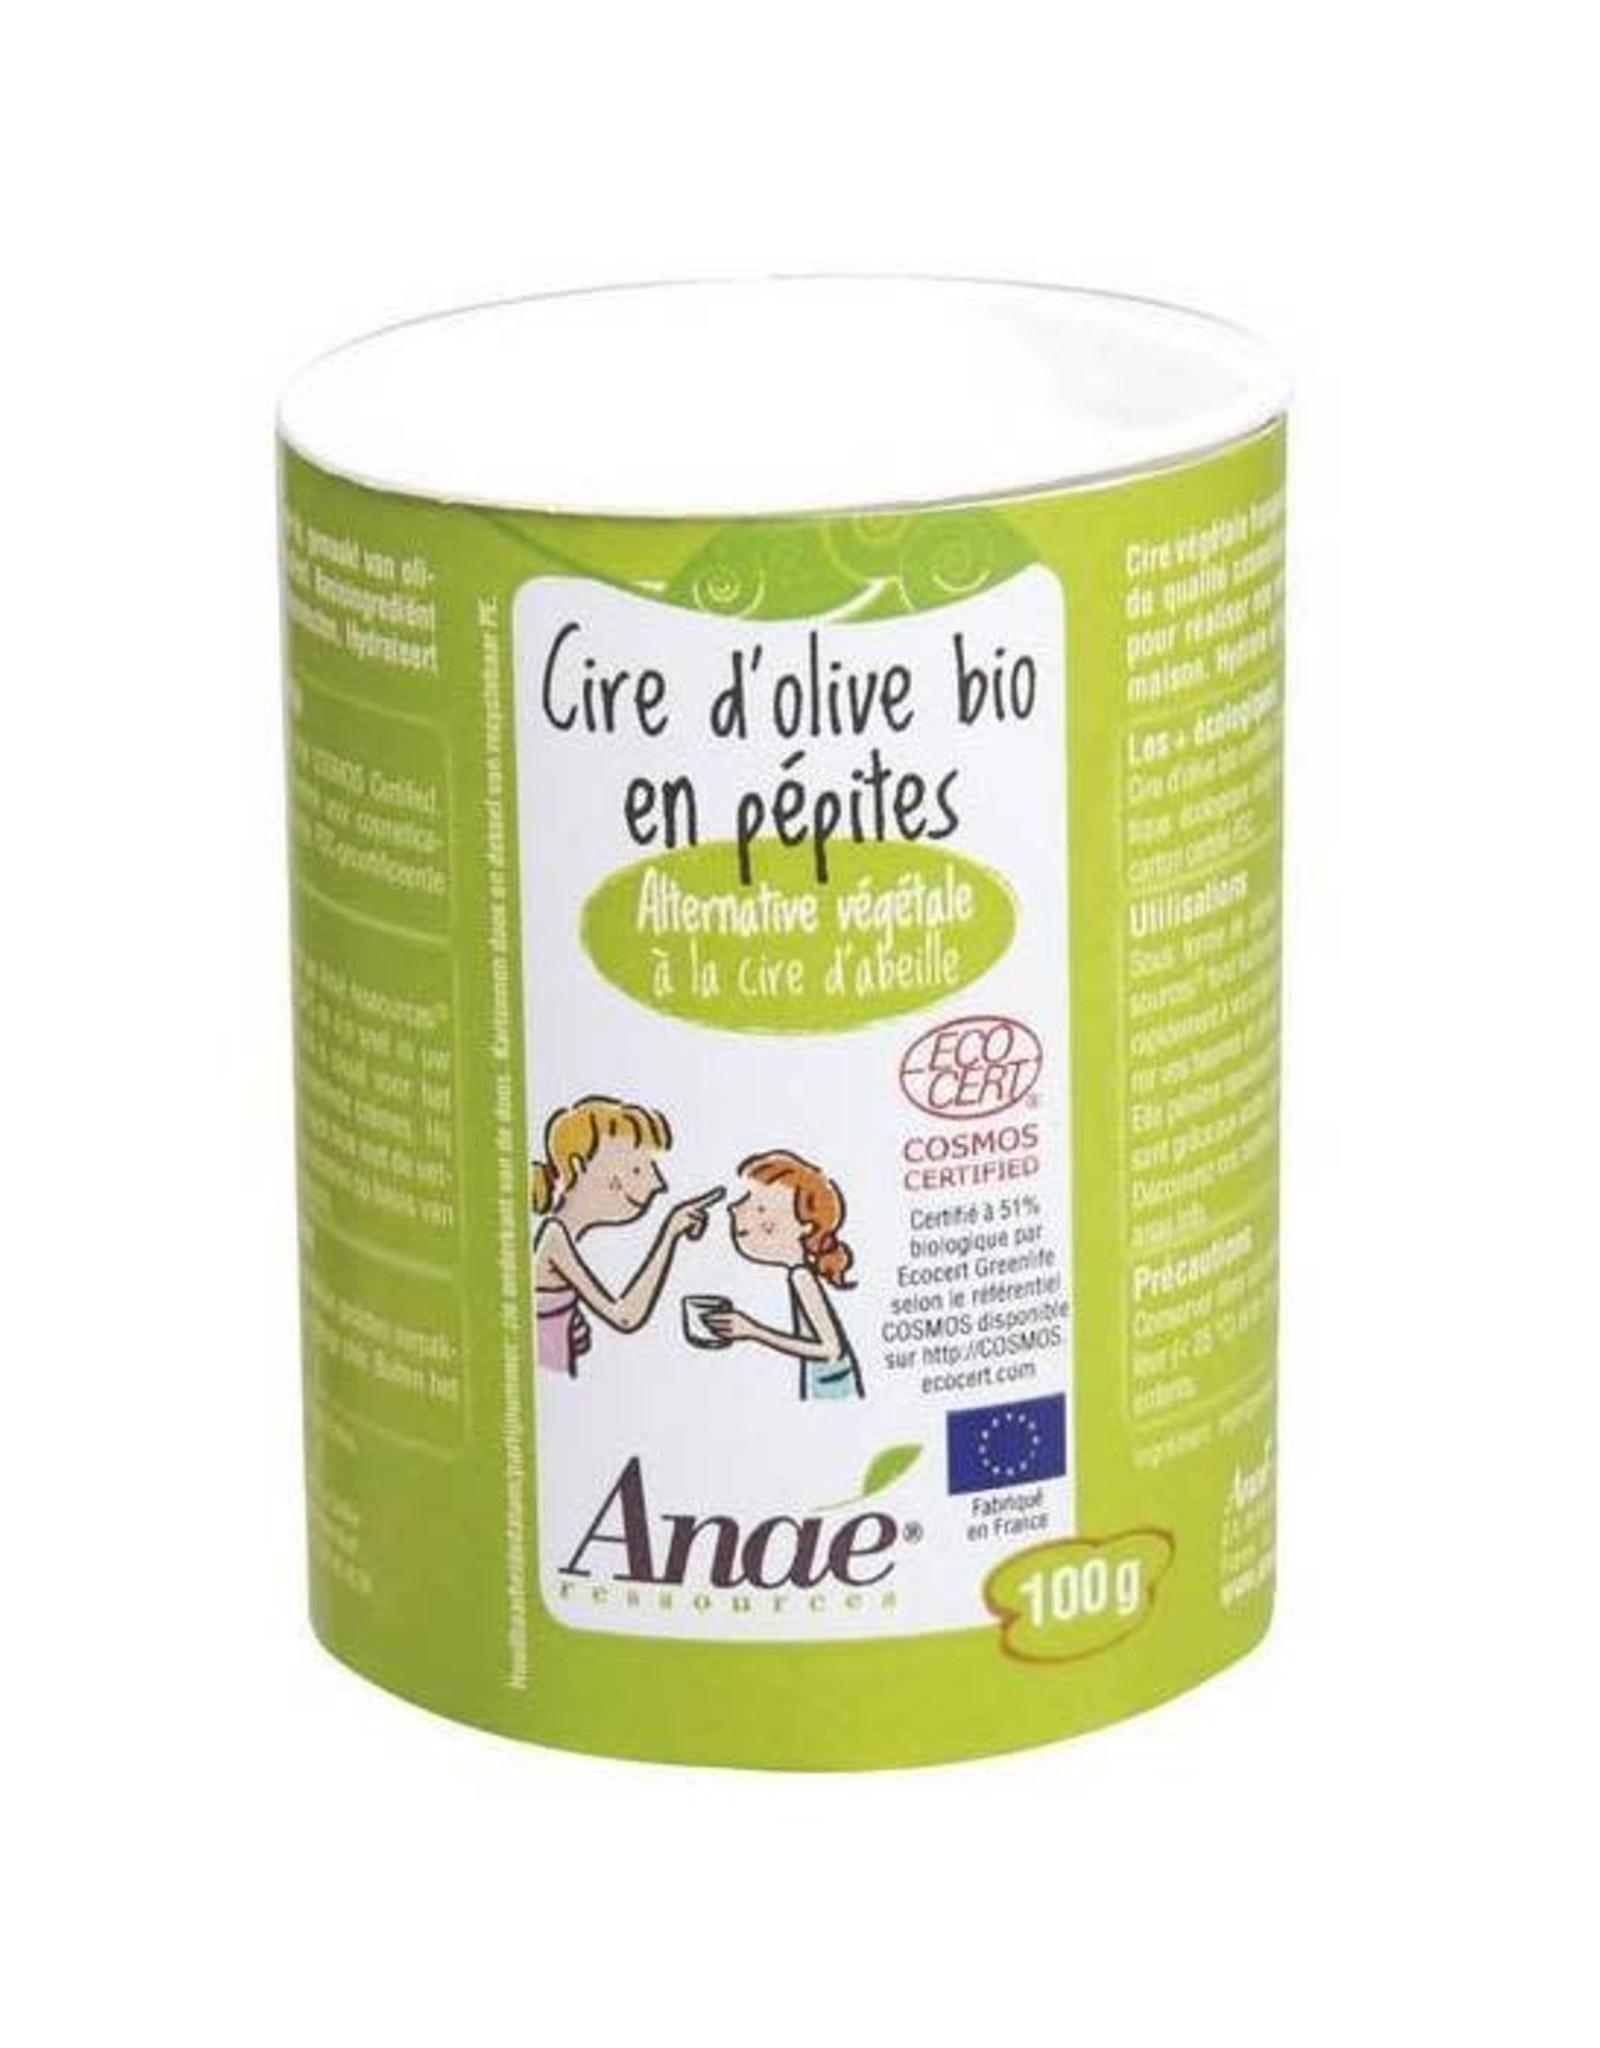 Anae Anae - Biologische olijfwas in korrels